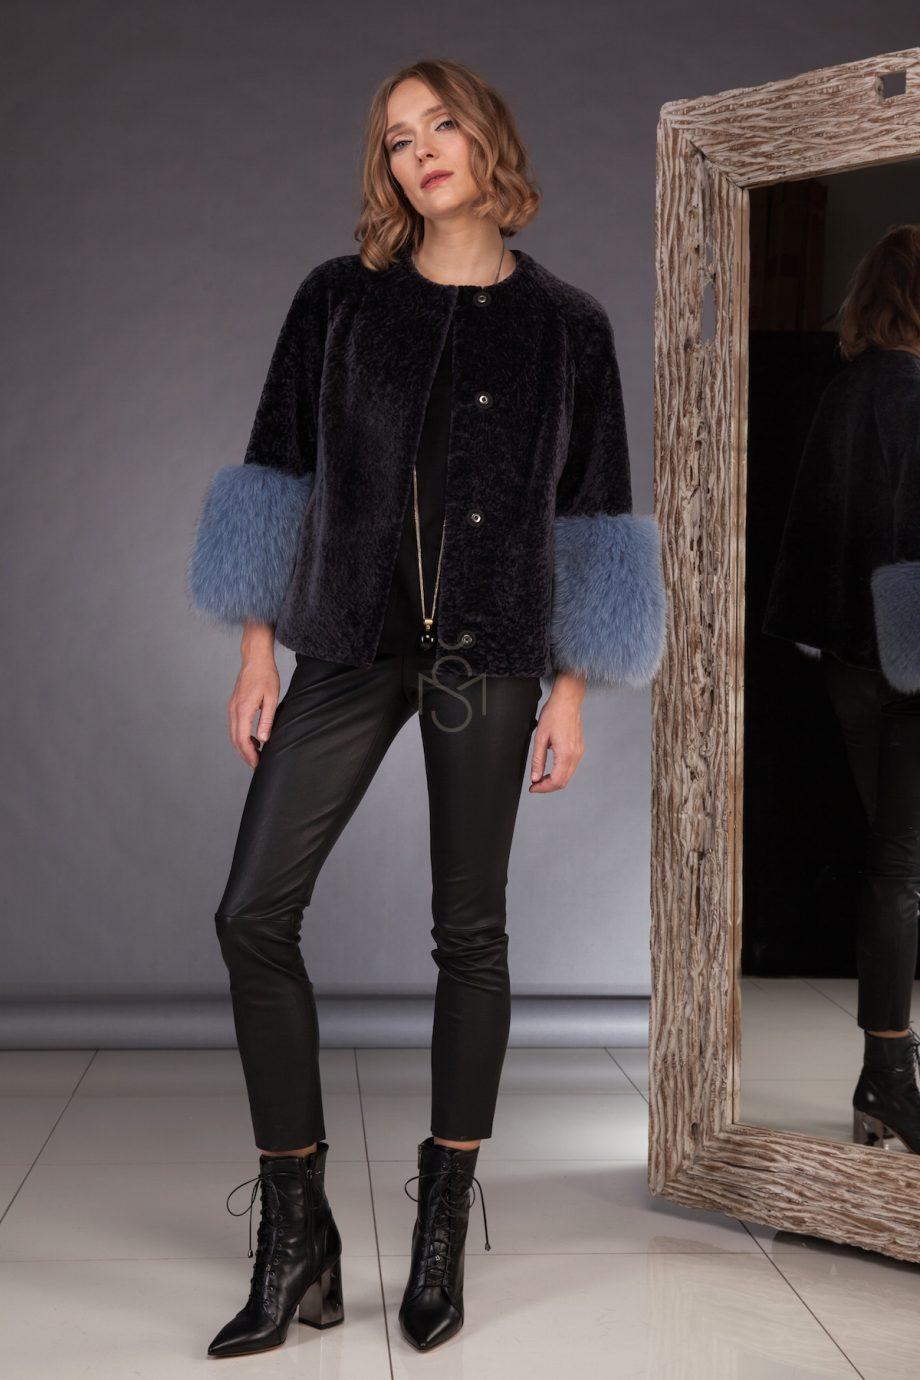 Sheepskin coat with fox fur sleeves made by SILTA MADA fur studio in Vilnius